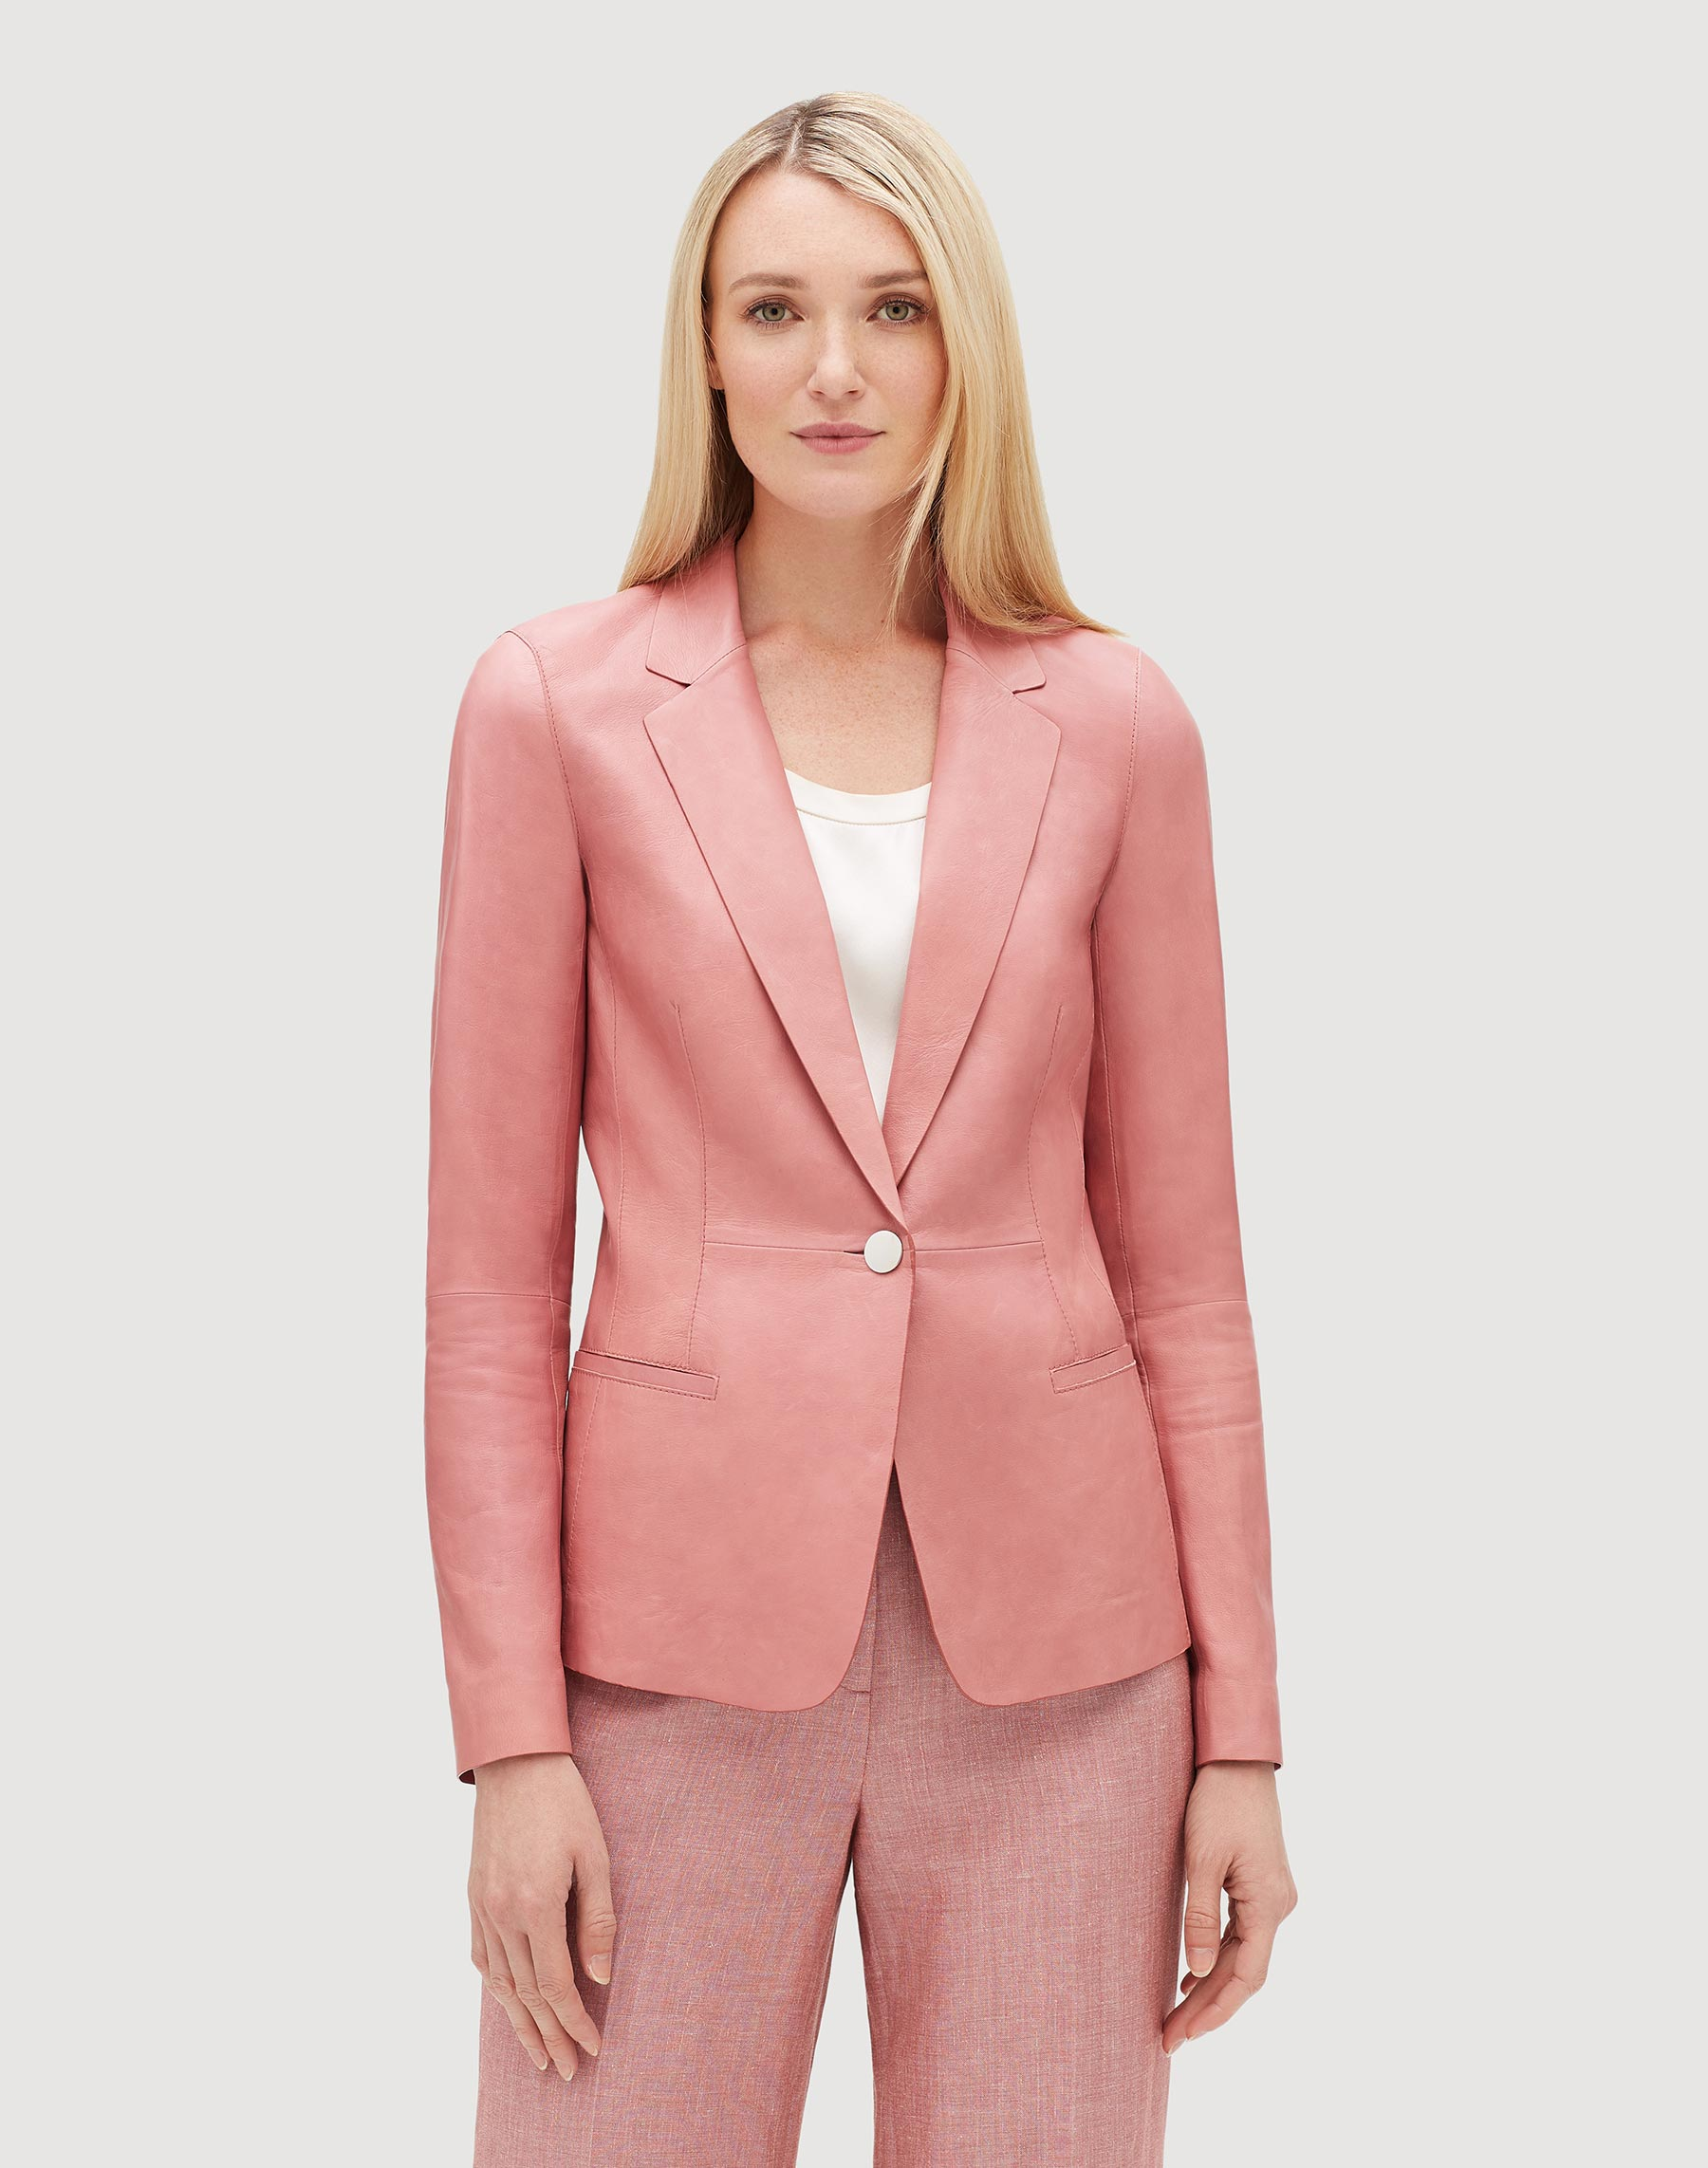 Modern Jackets Women S Designer Coats Lafayette 148 New York